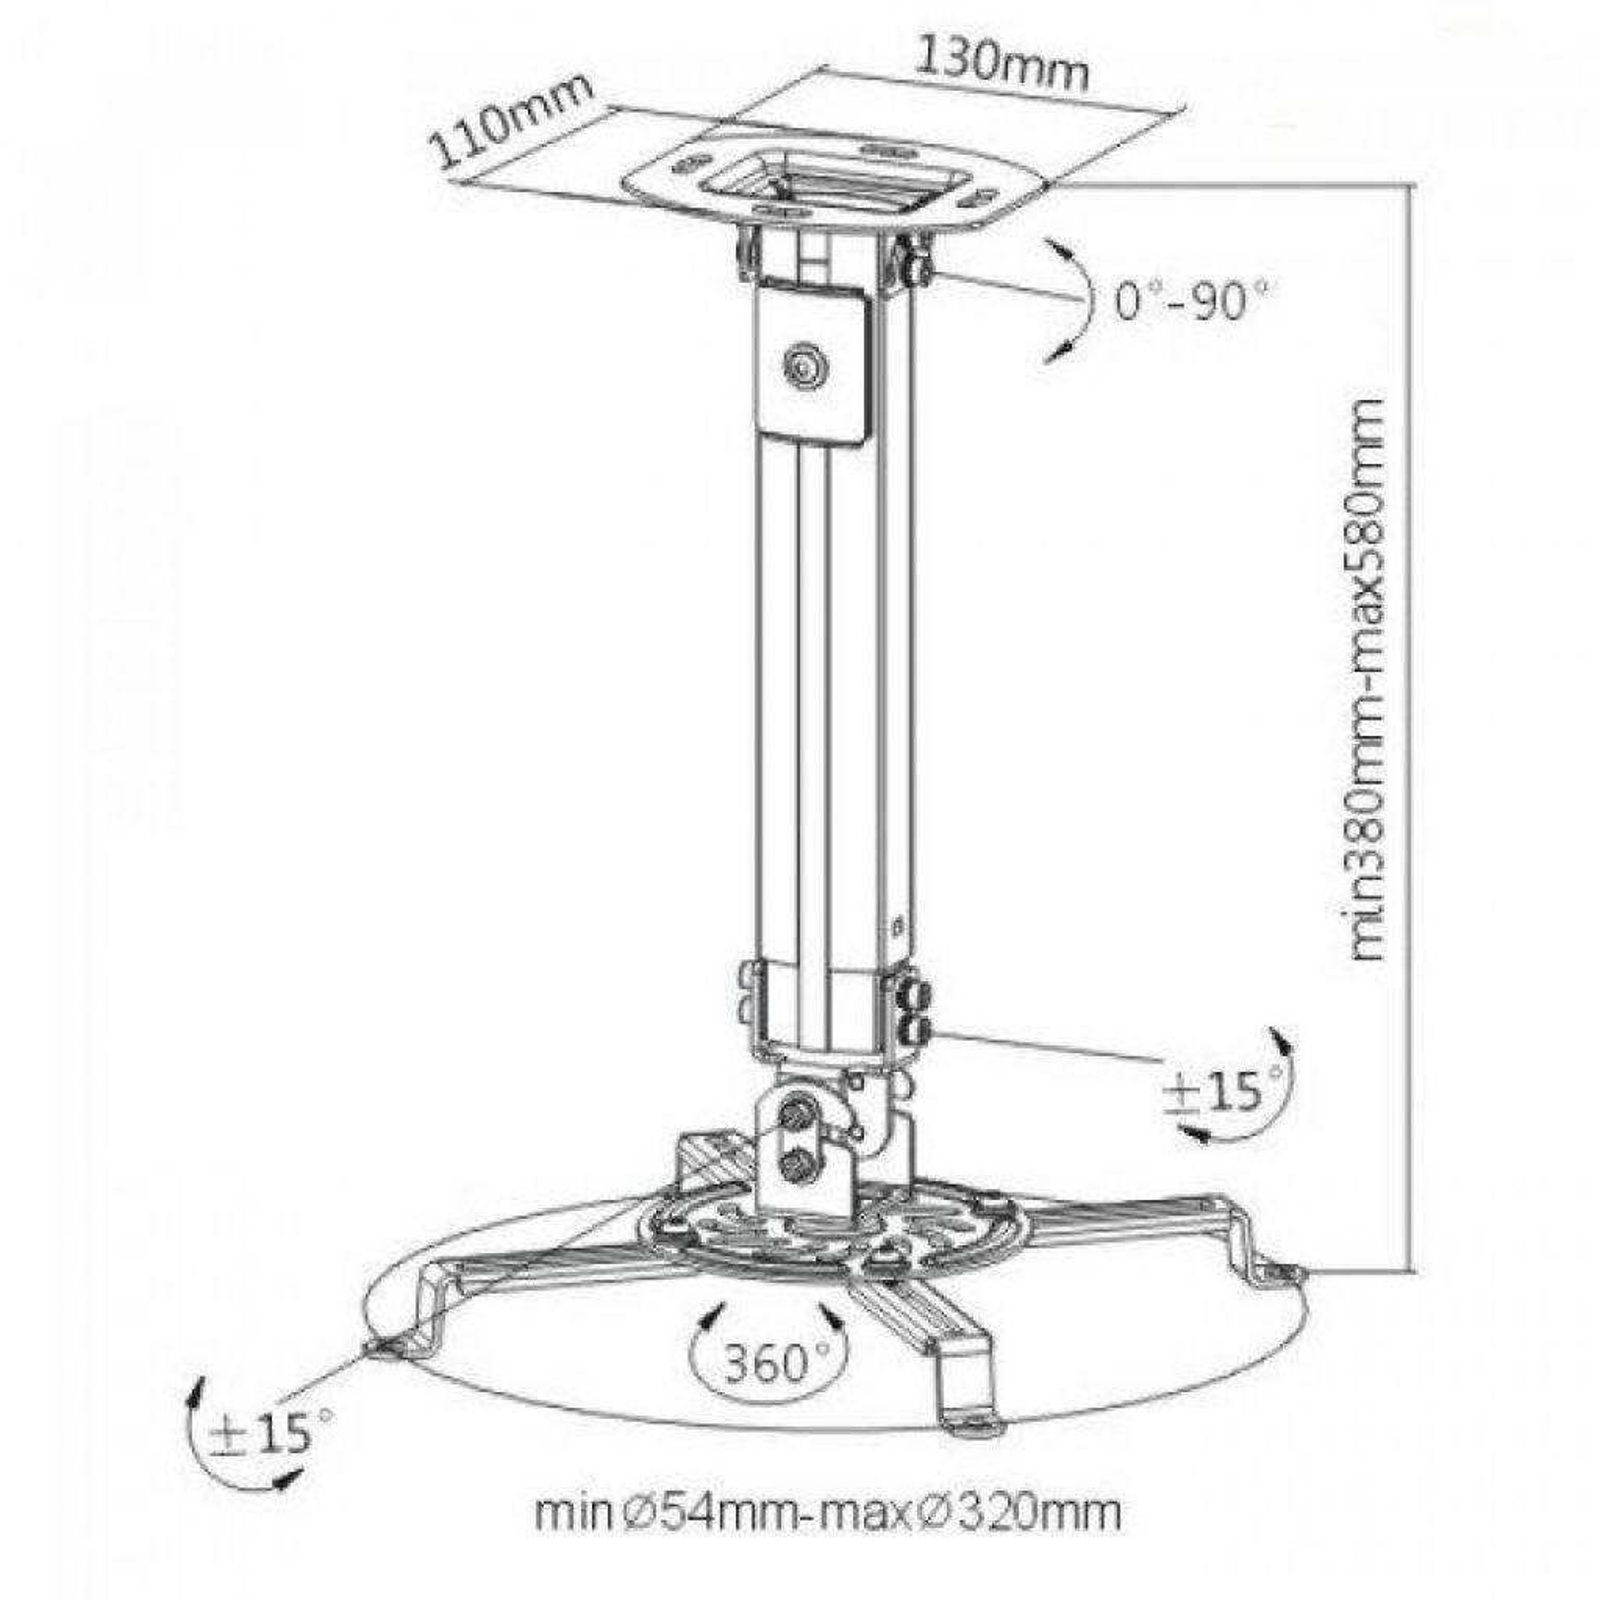 Кронштейн для проектора ITech PRB-07B (PRB-07В) изображение 2